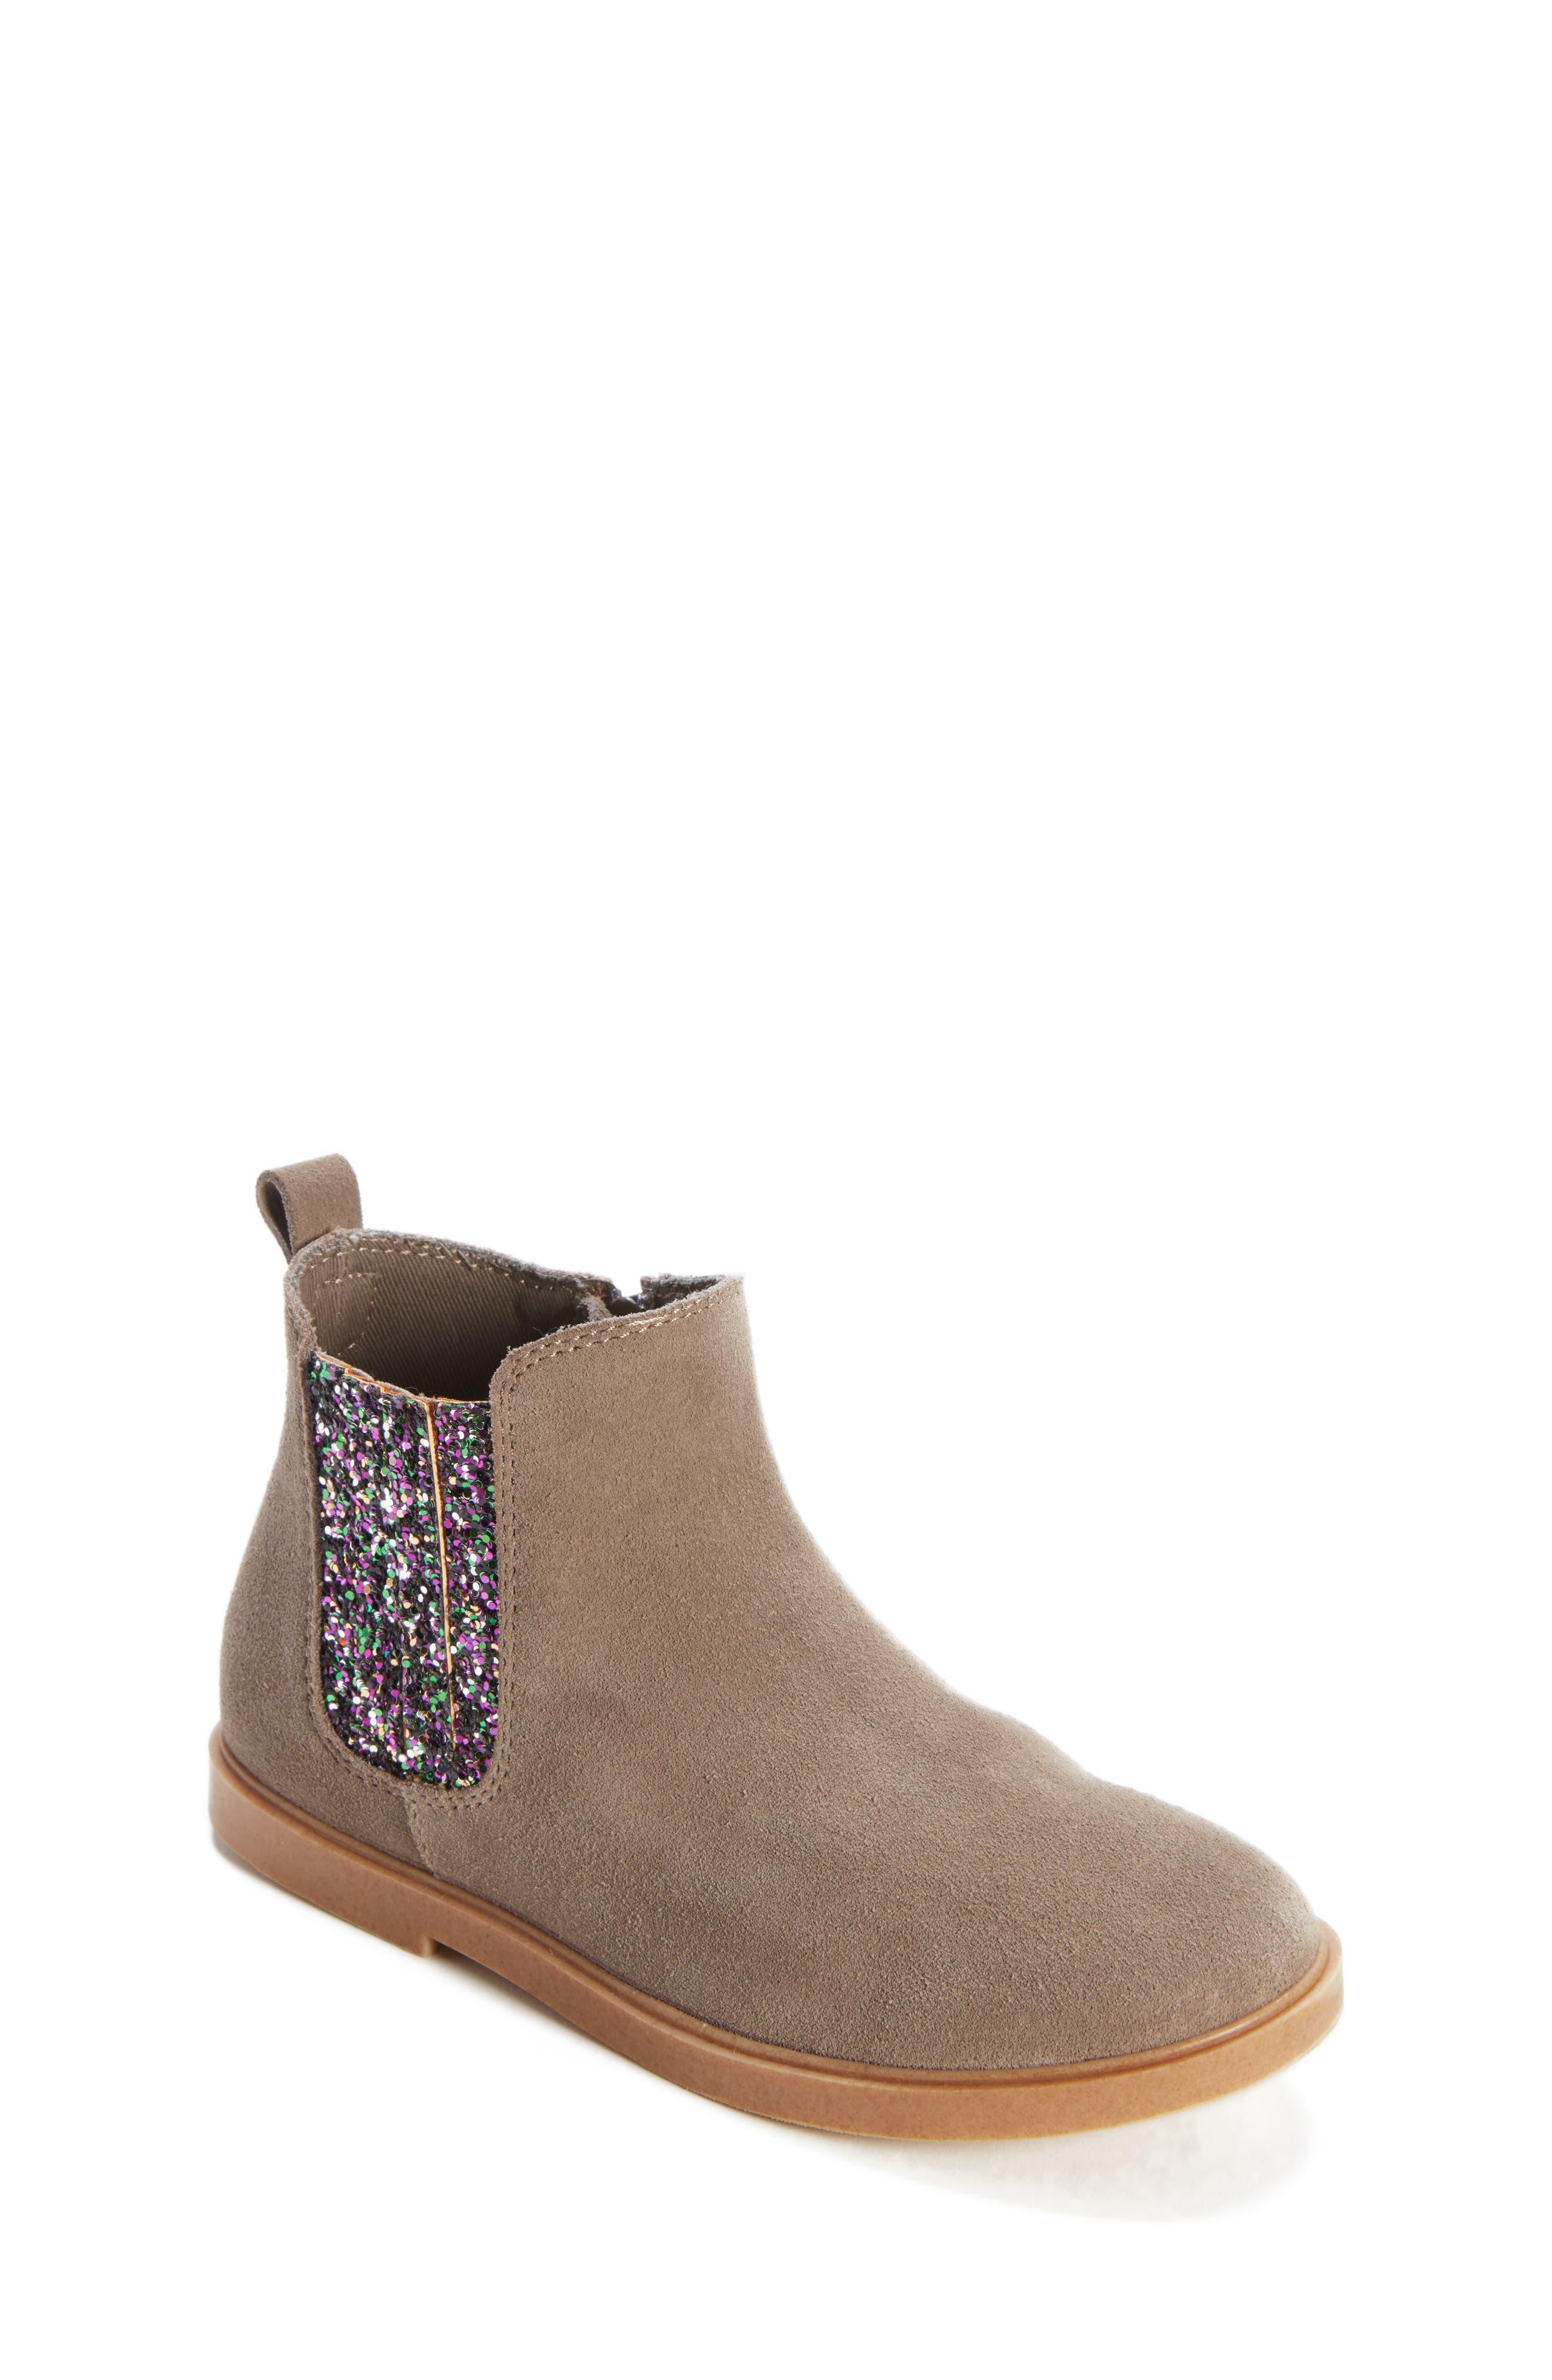 Alice Glitter Chelsea Boot,                         Main,                         color, GREY SUEDE